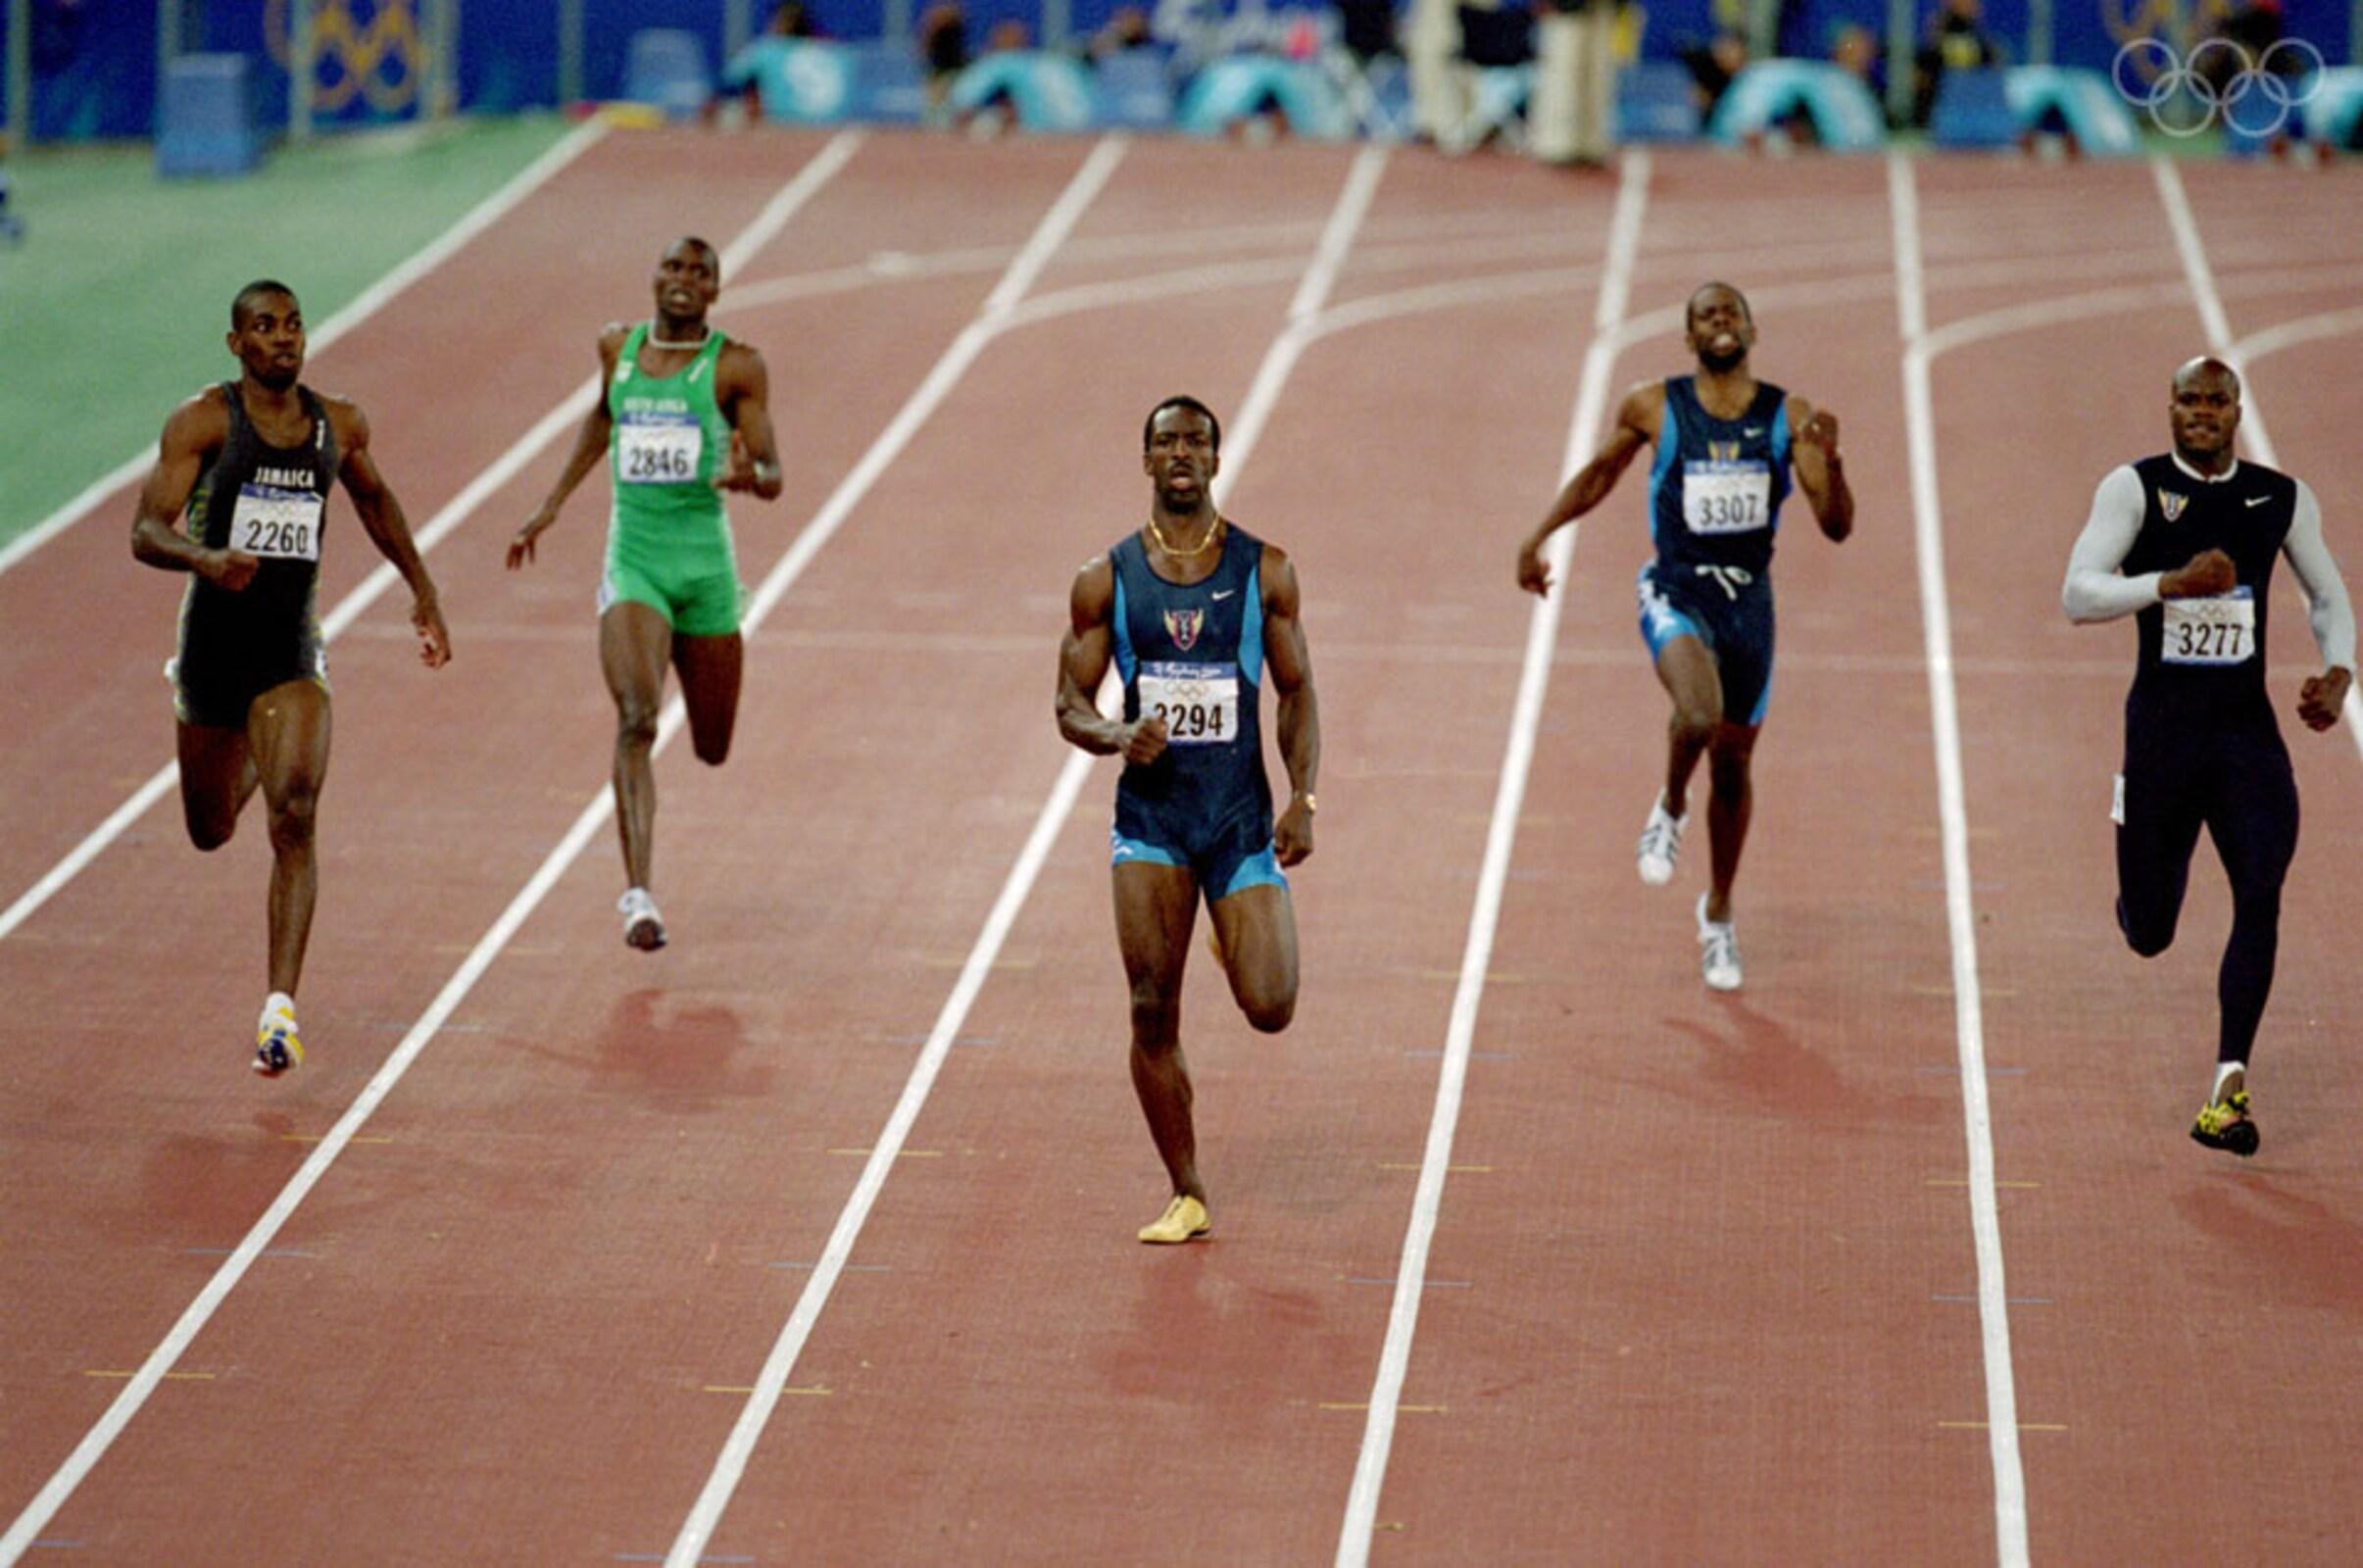 Michael Johnson optou por entregar a sua medalha de ouro nos 4x400 metros, depois dos escândalos de doping que envolveram os seus colegas de equipa.